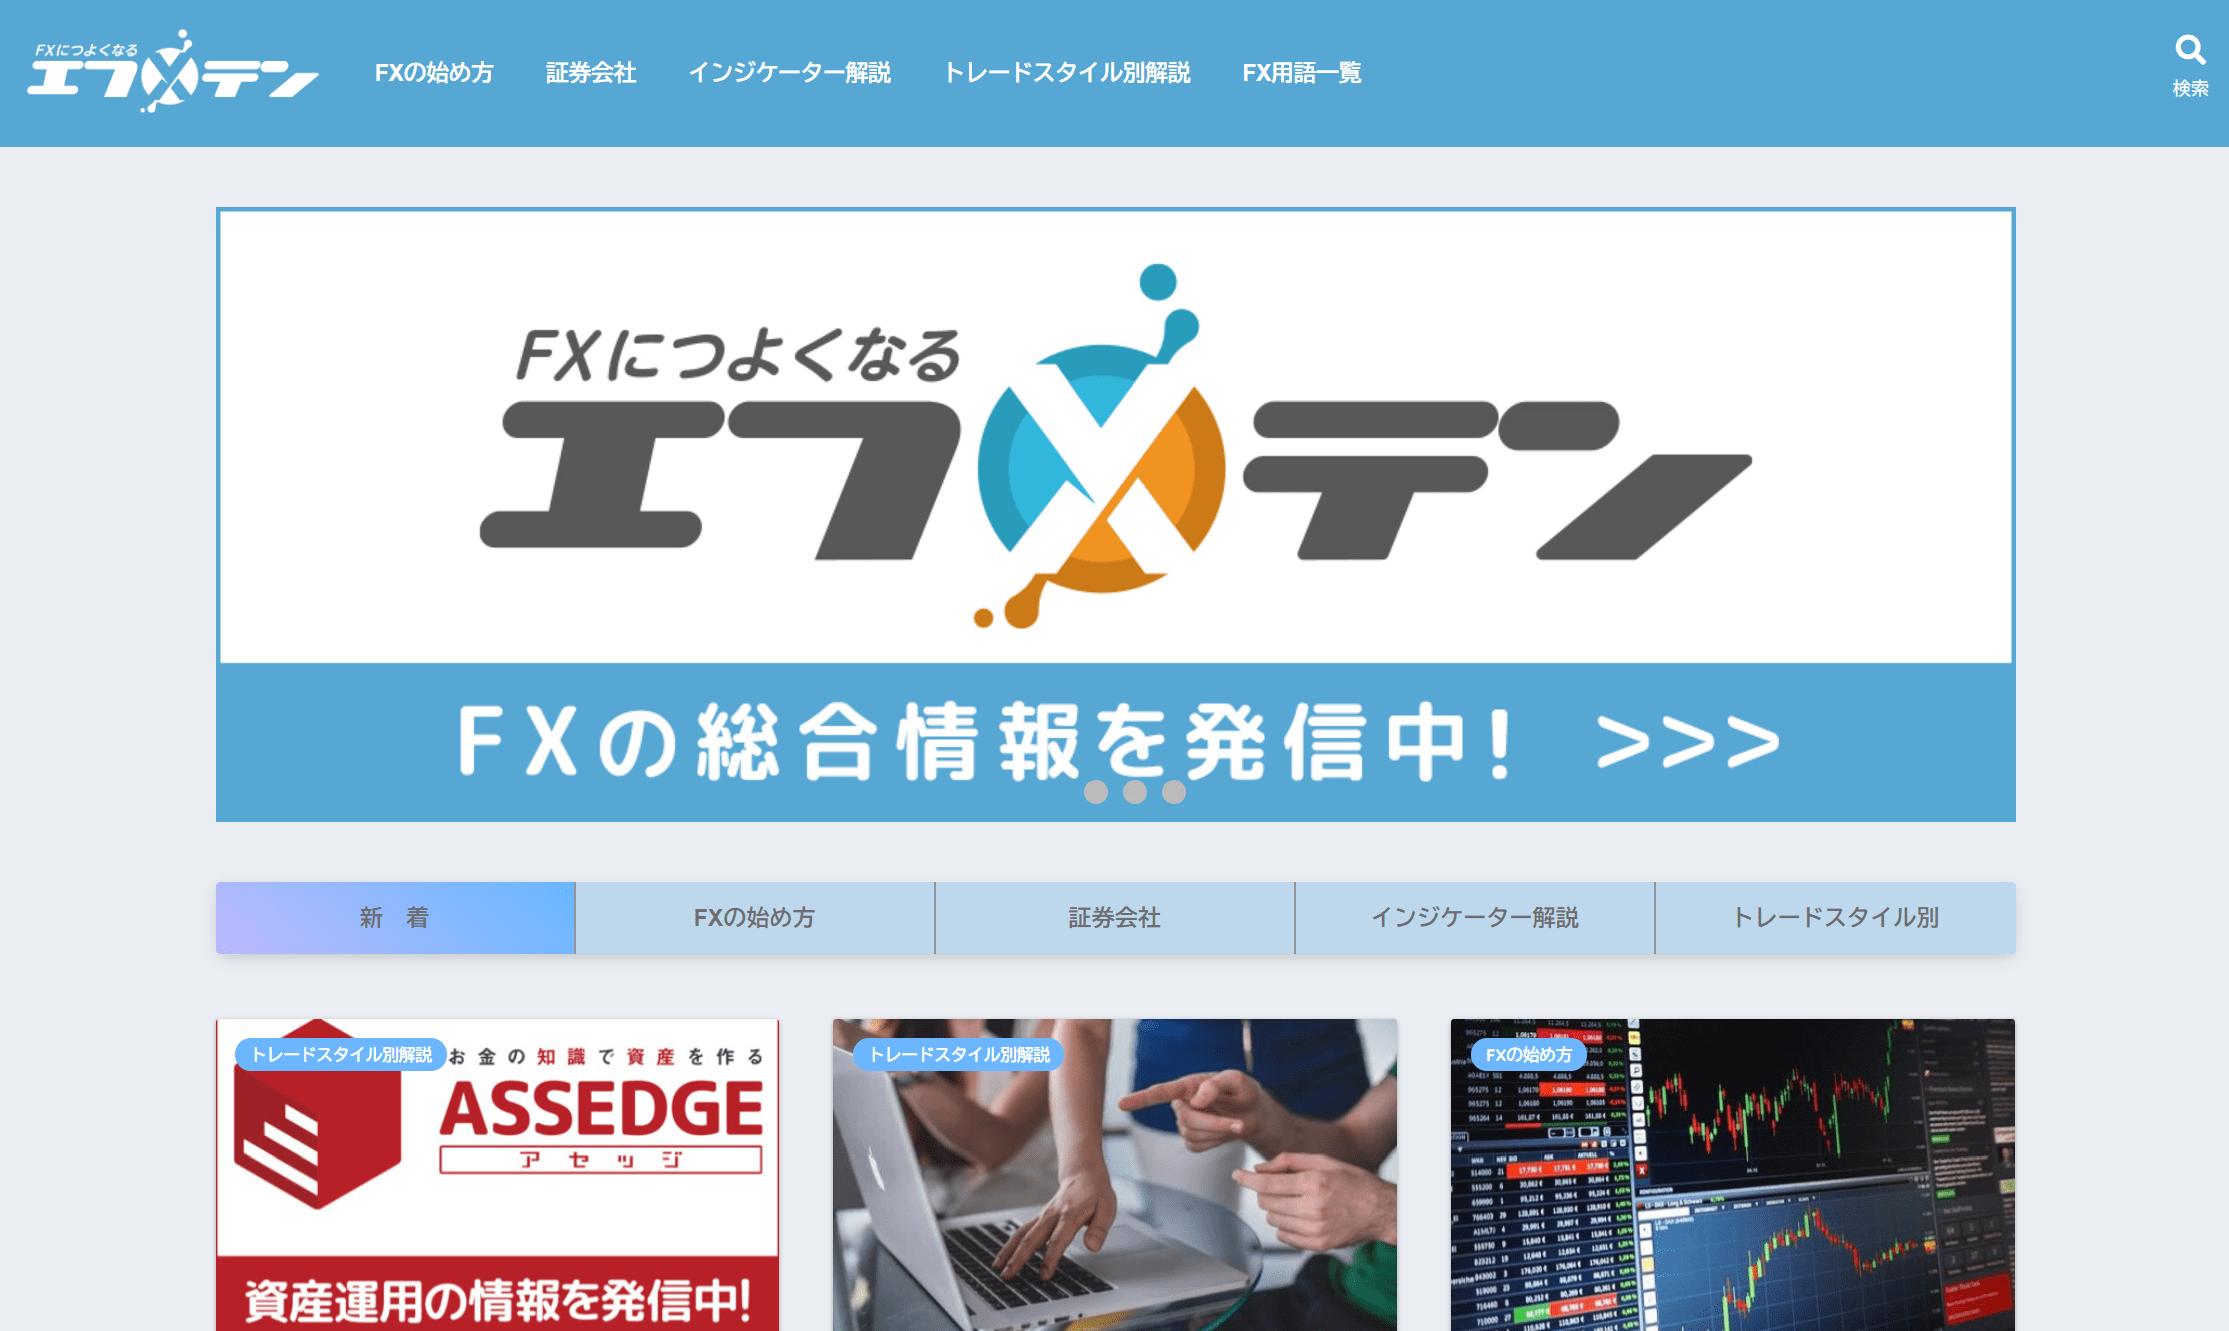 FX初心者向けの情報サイト「エフテン」